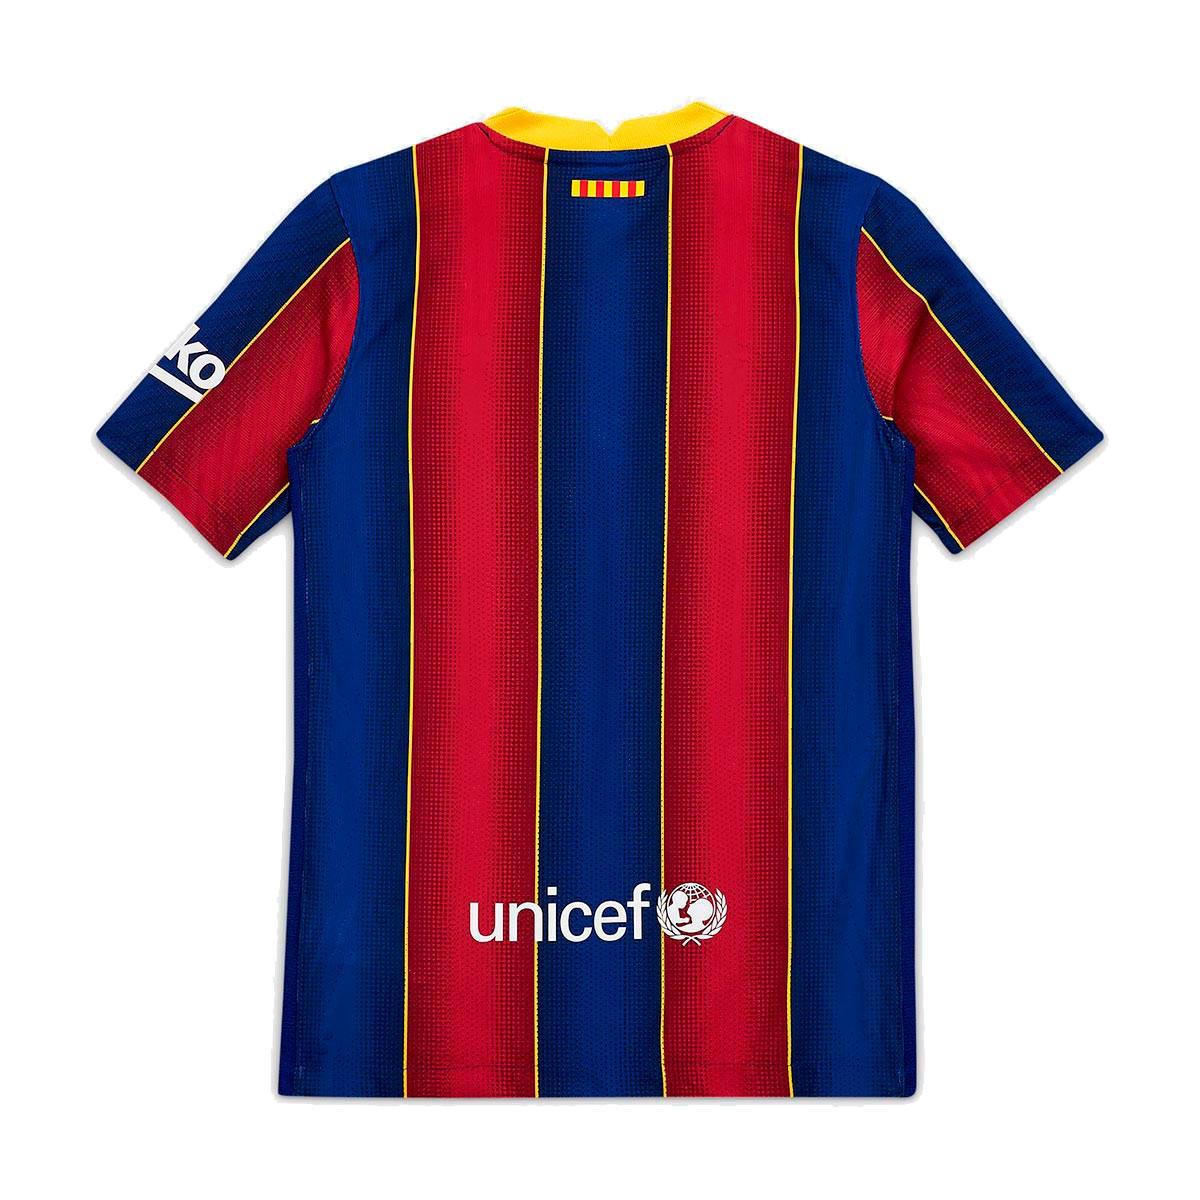 Jersey Nike Fc Barcelona Vapor Match Primera Equipacion 2020 2021 Nino Deep Royal Blue Varsity Maize Football Store Futbol Emotion